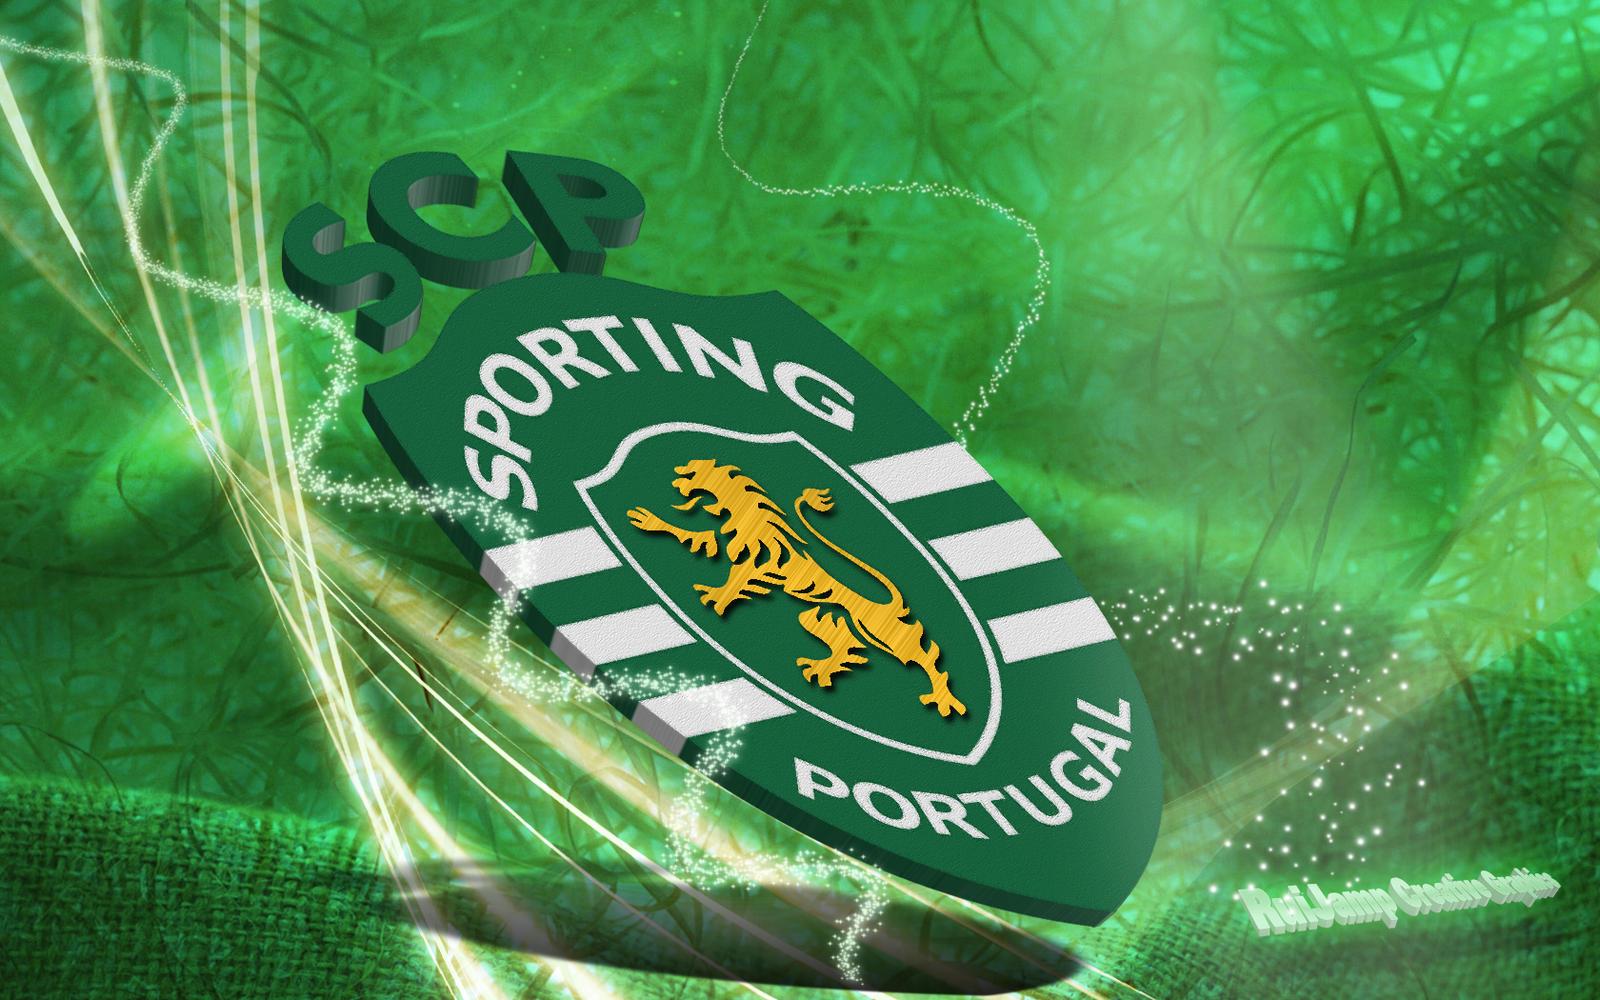 Sporting Club Portugal By RJamp On DeviantArt